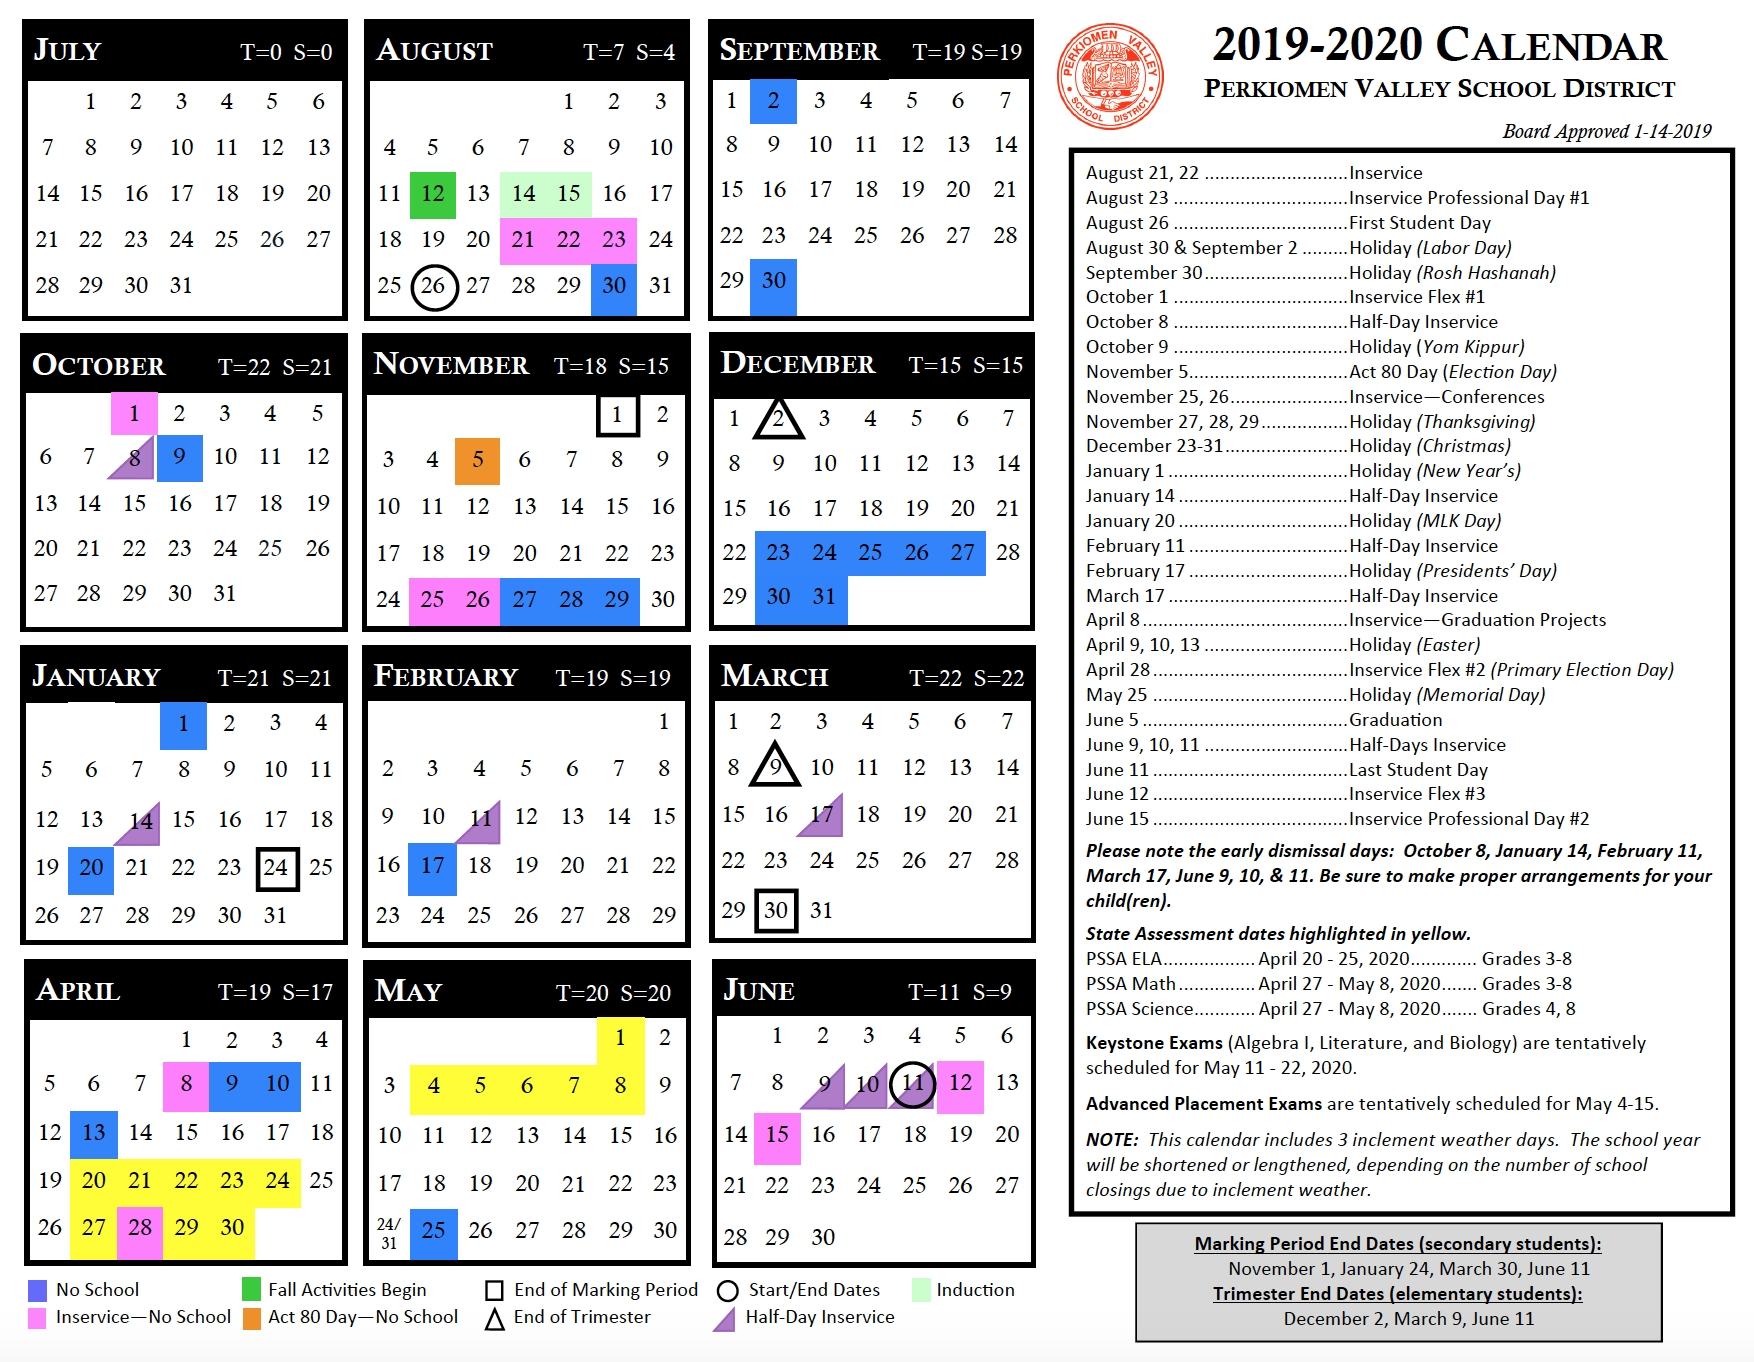 Instructional Calendar - Perkiomen Valley School District Year Round Calendar Jordan School District